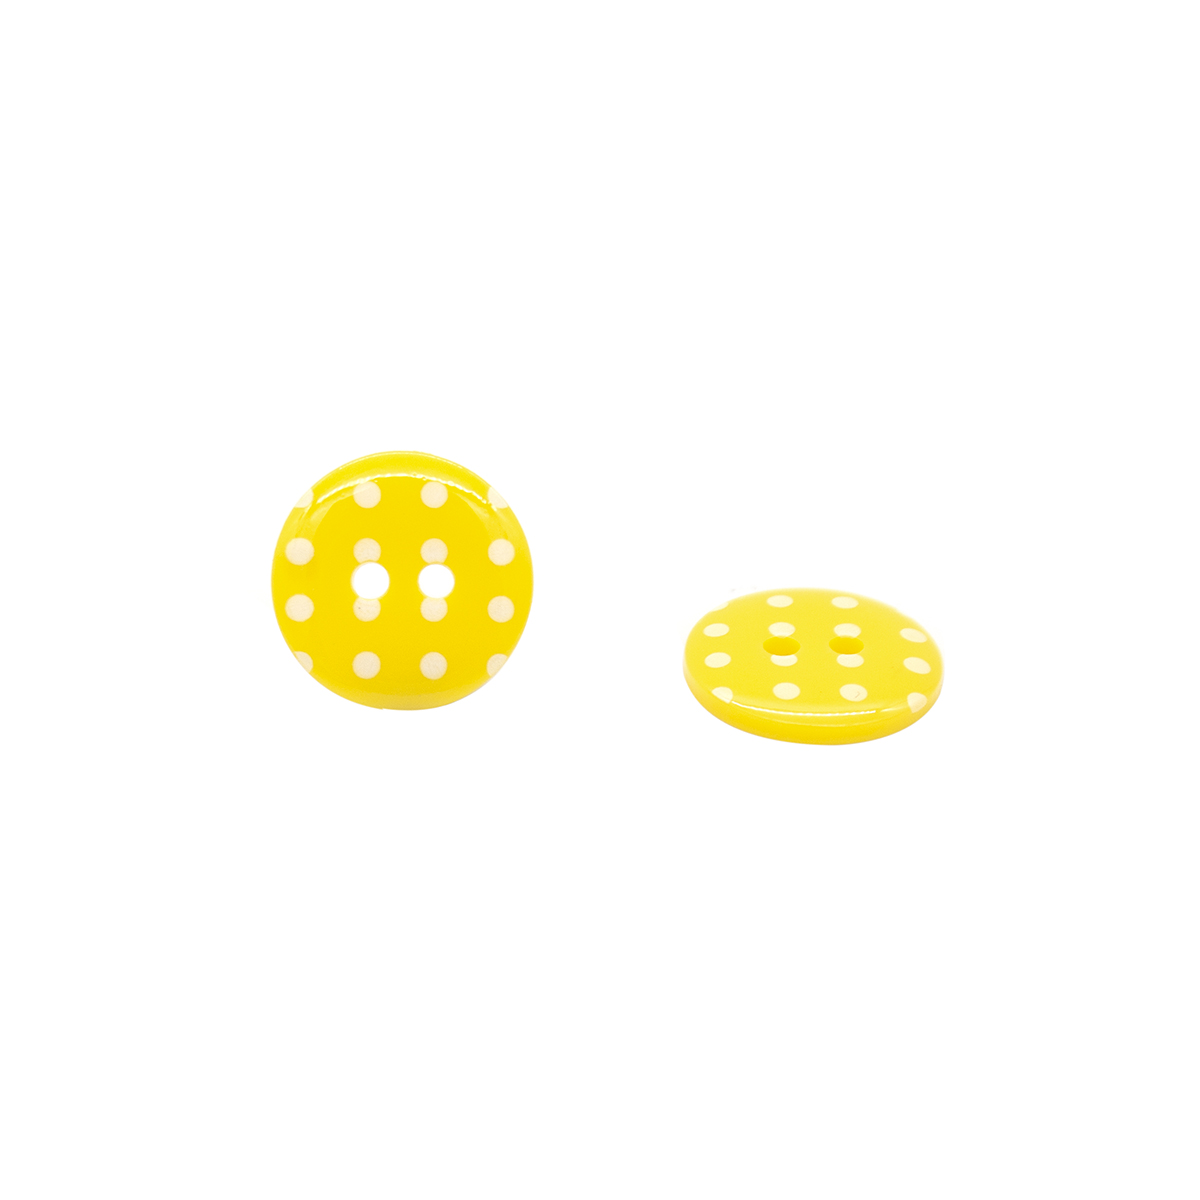 Q7125 FSS Пуговица, Горошек 24L (113 желтый)